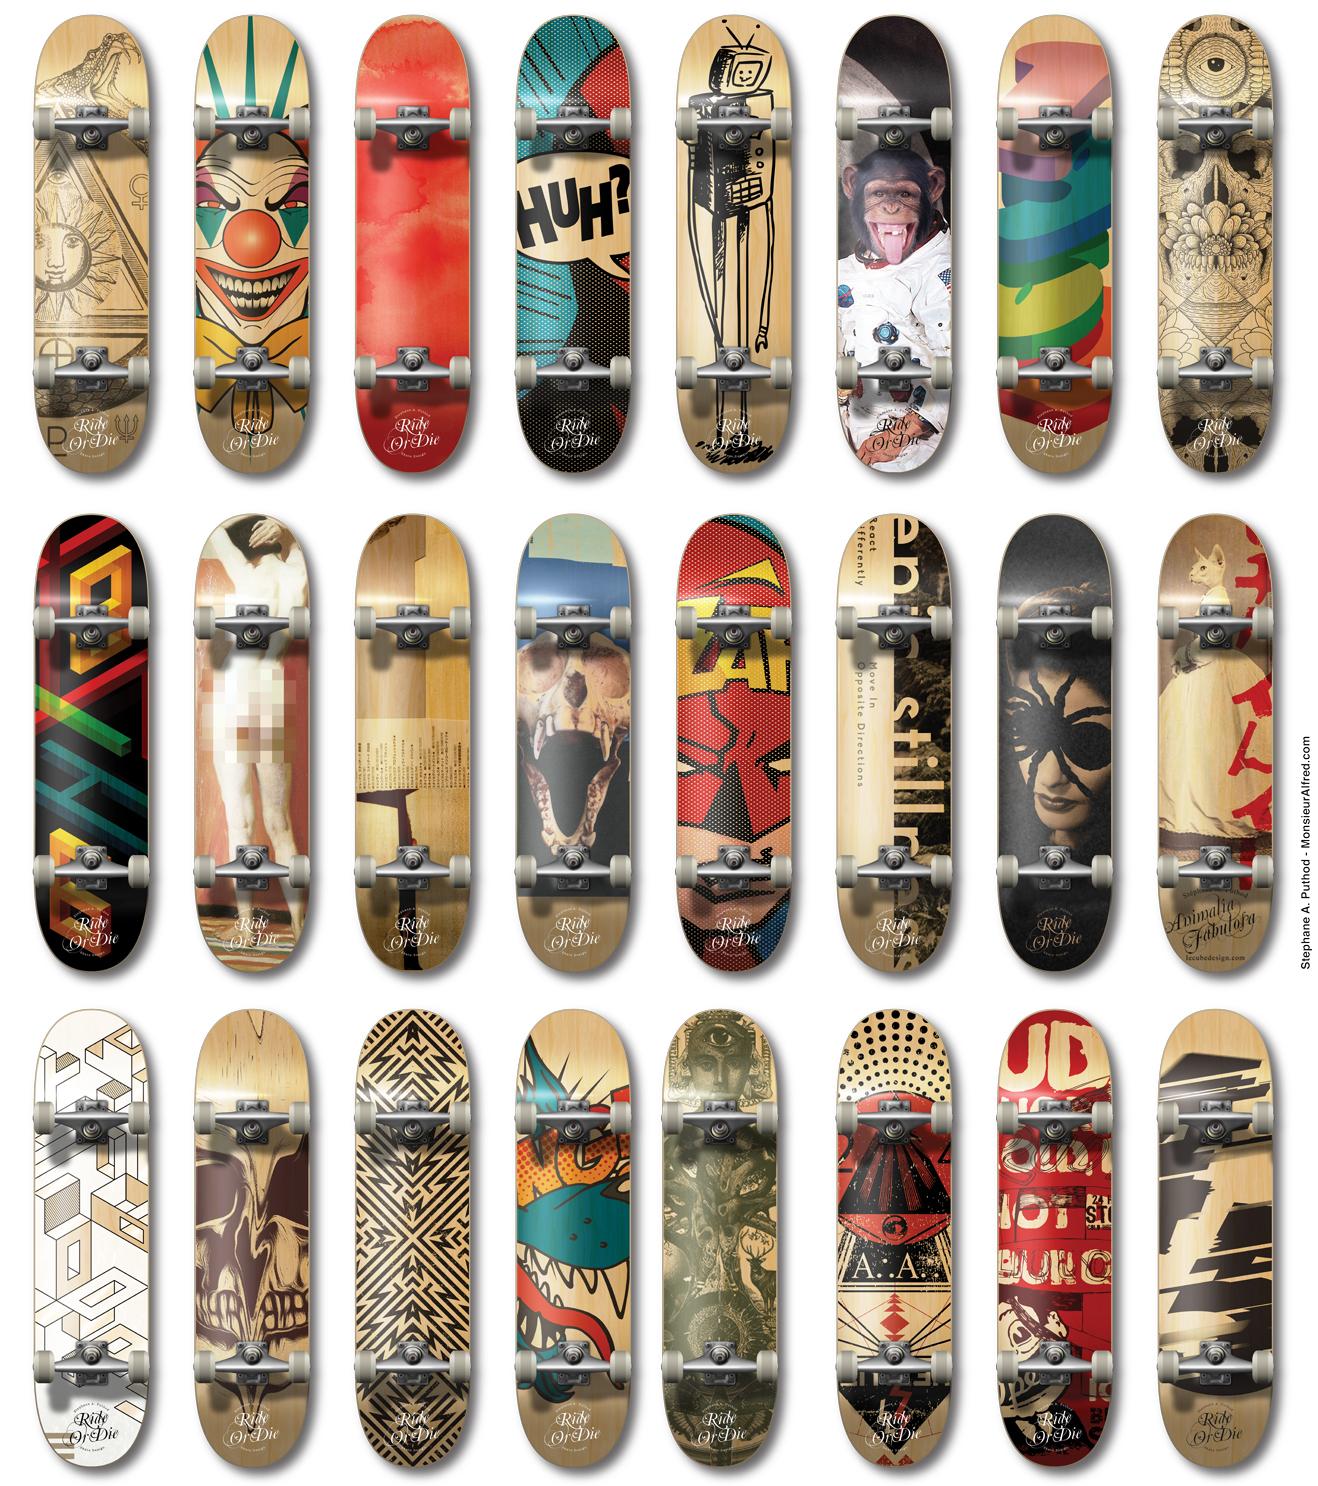 SkateCollection